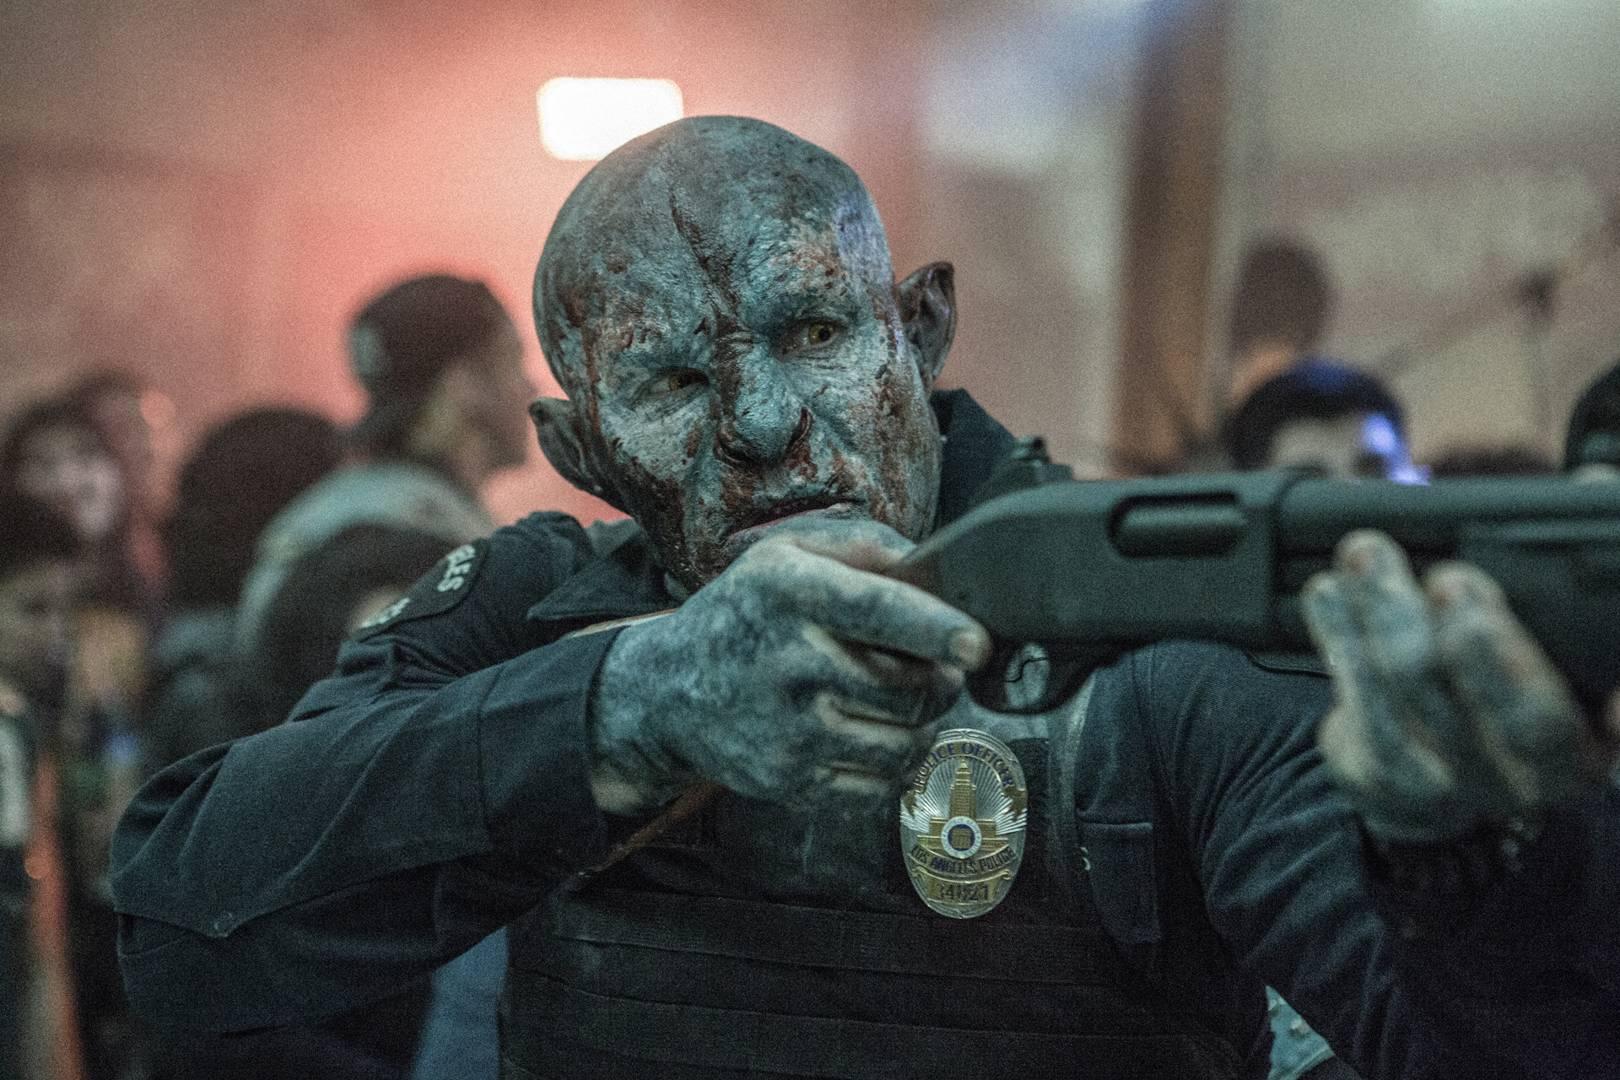 Why do critics hate Netflix movies so much?